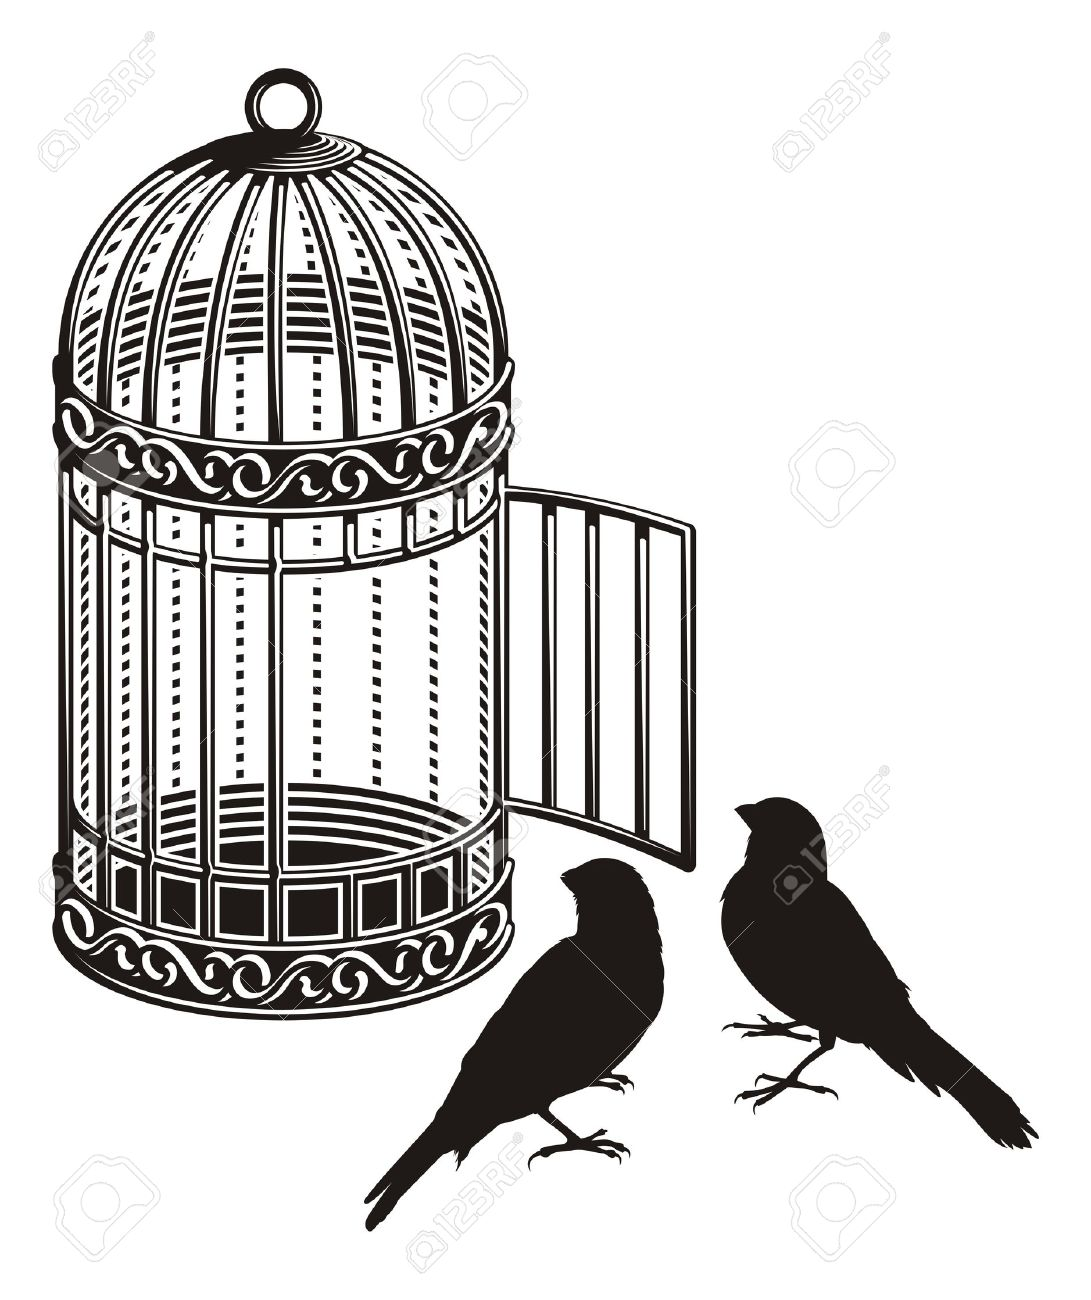 Metallic bird cage with open door and two bird silhouettes. Stock Vector - 11092921